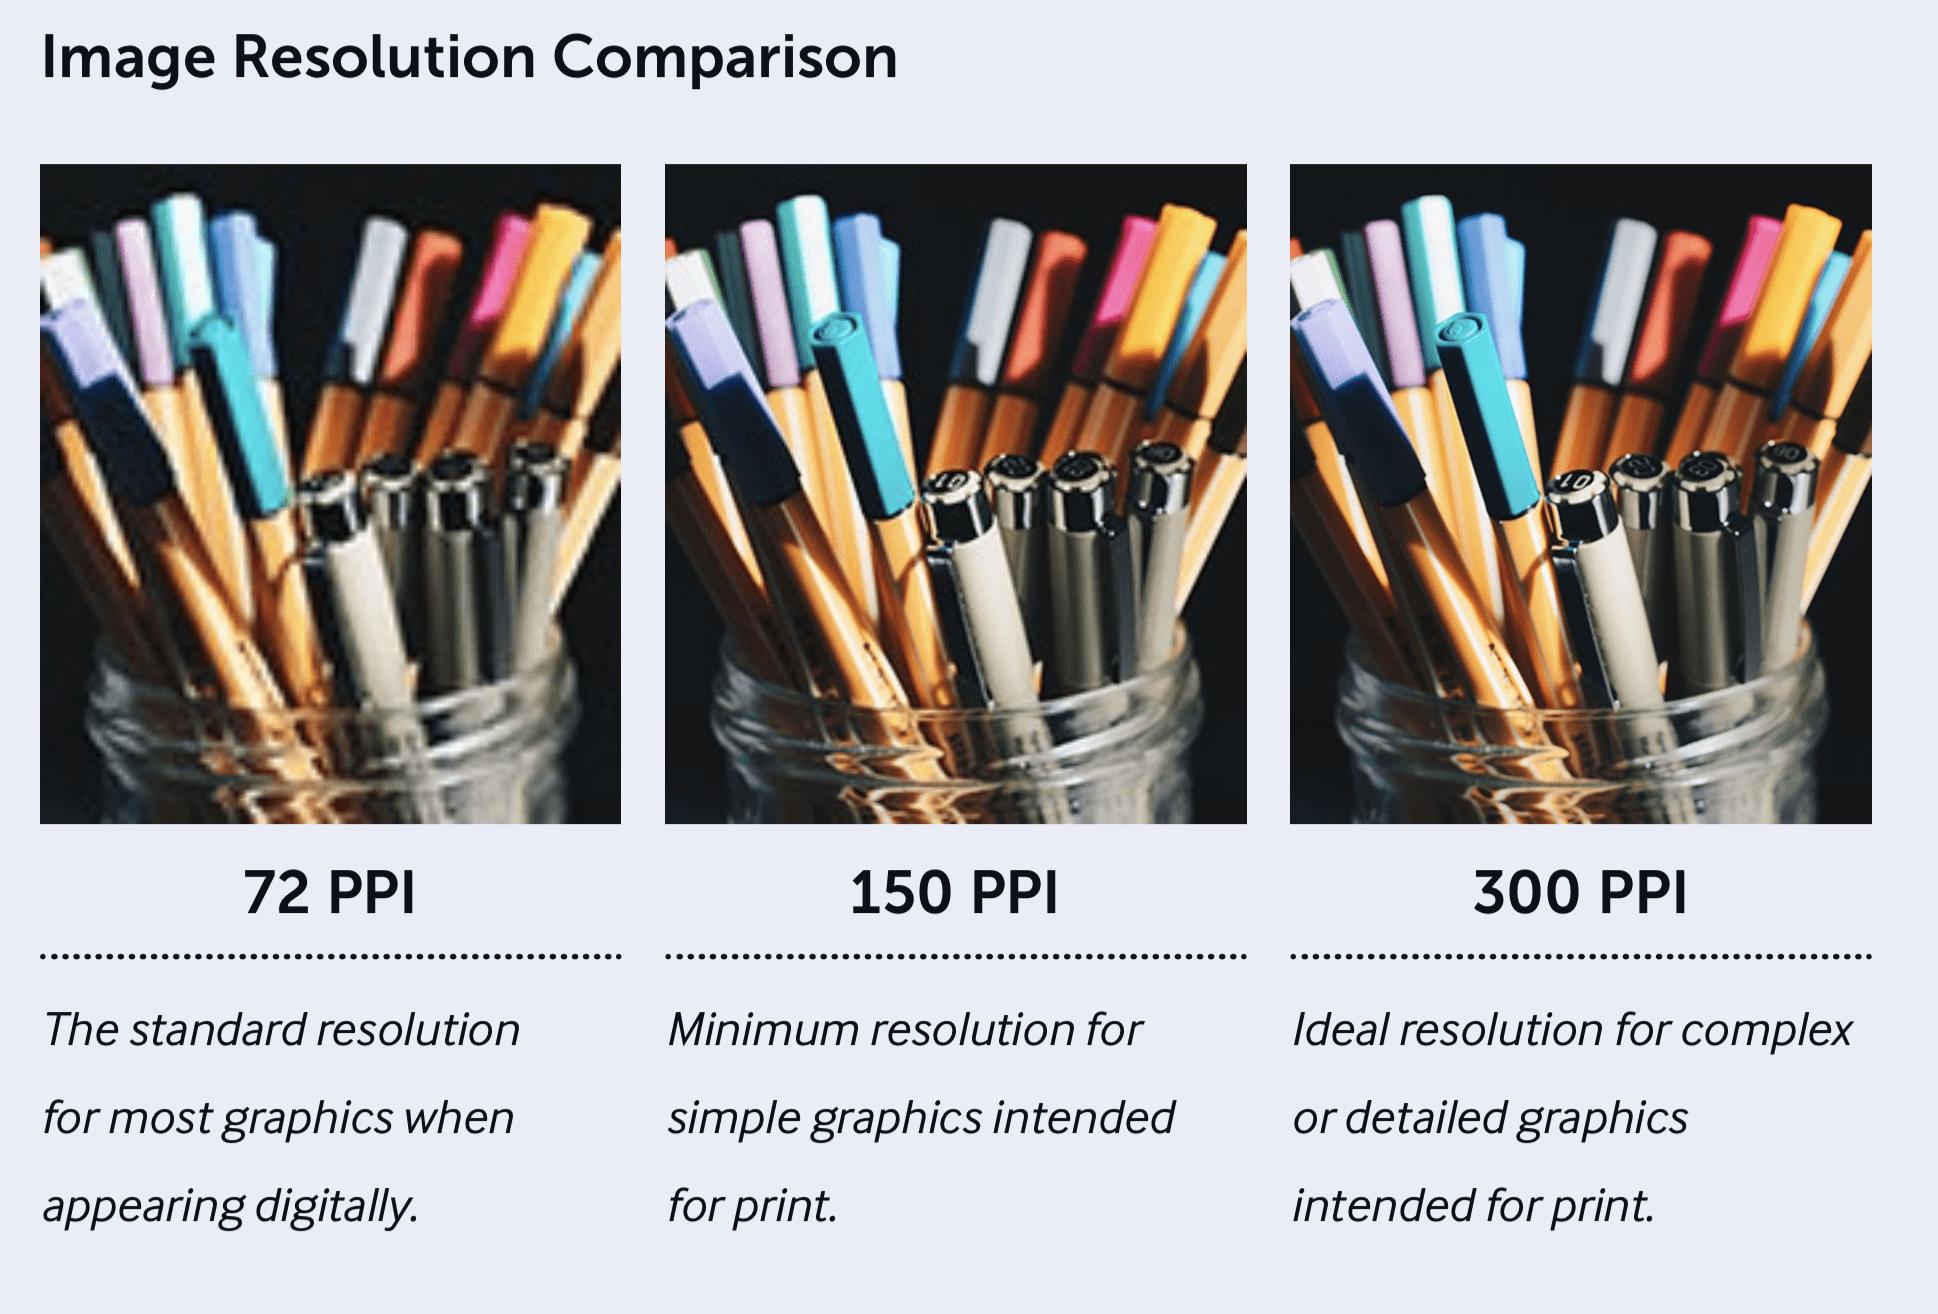 Image resolution comparison